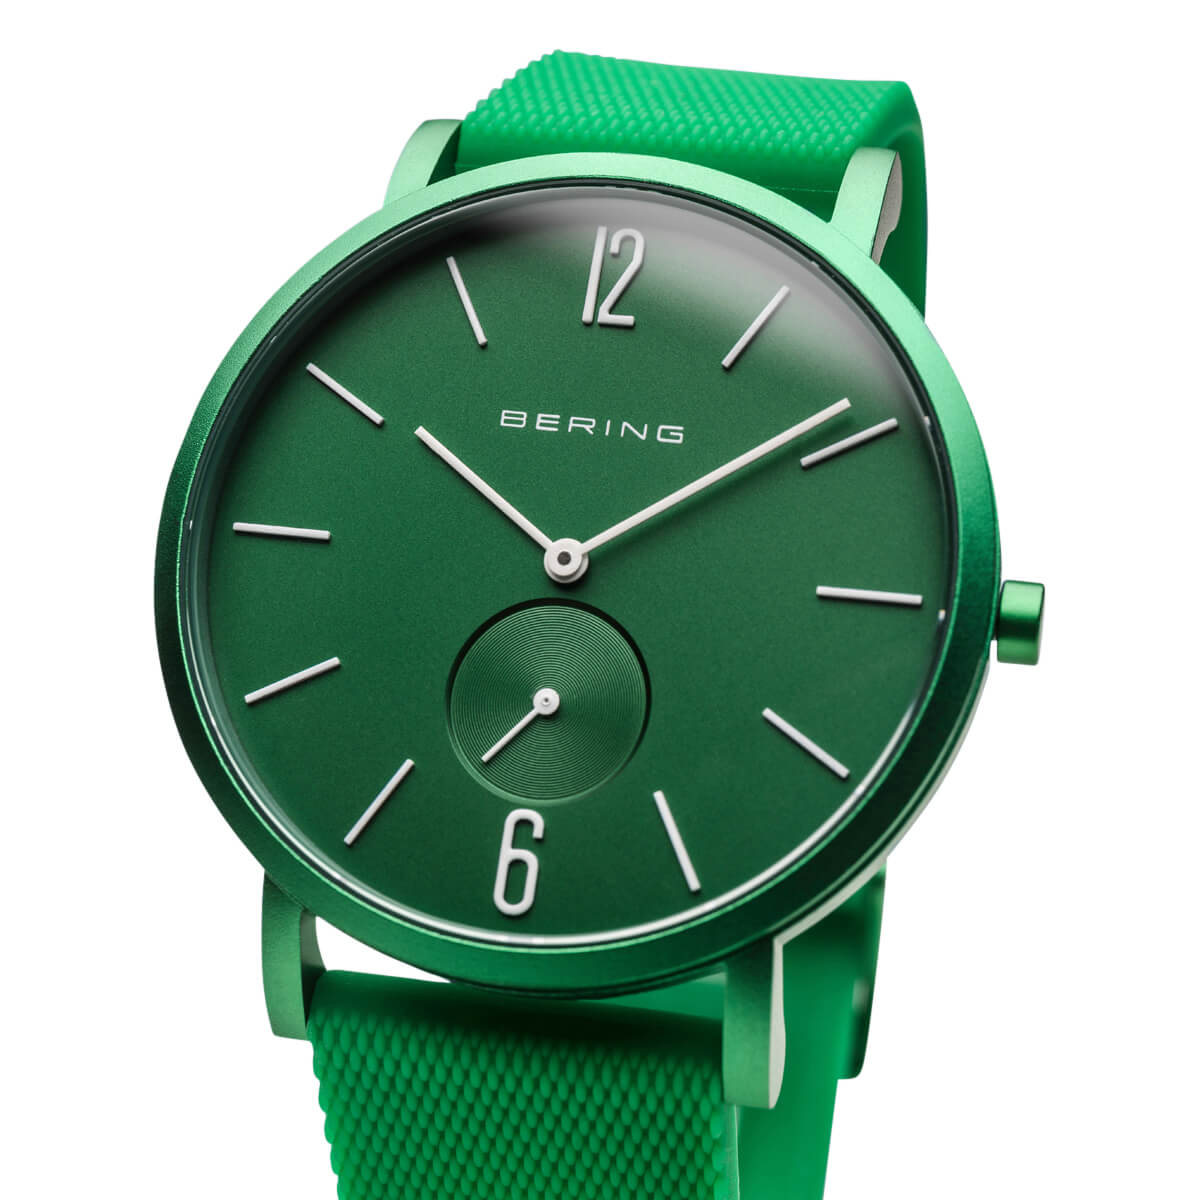 Bering Green Analogue Men's Watch – 16940-899(2)